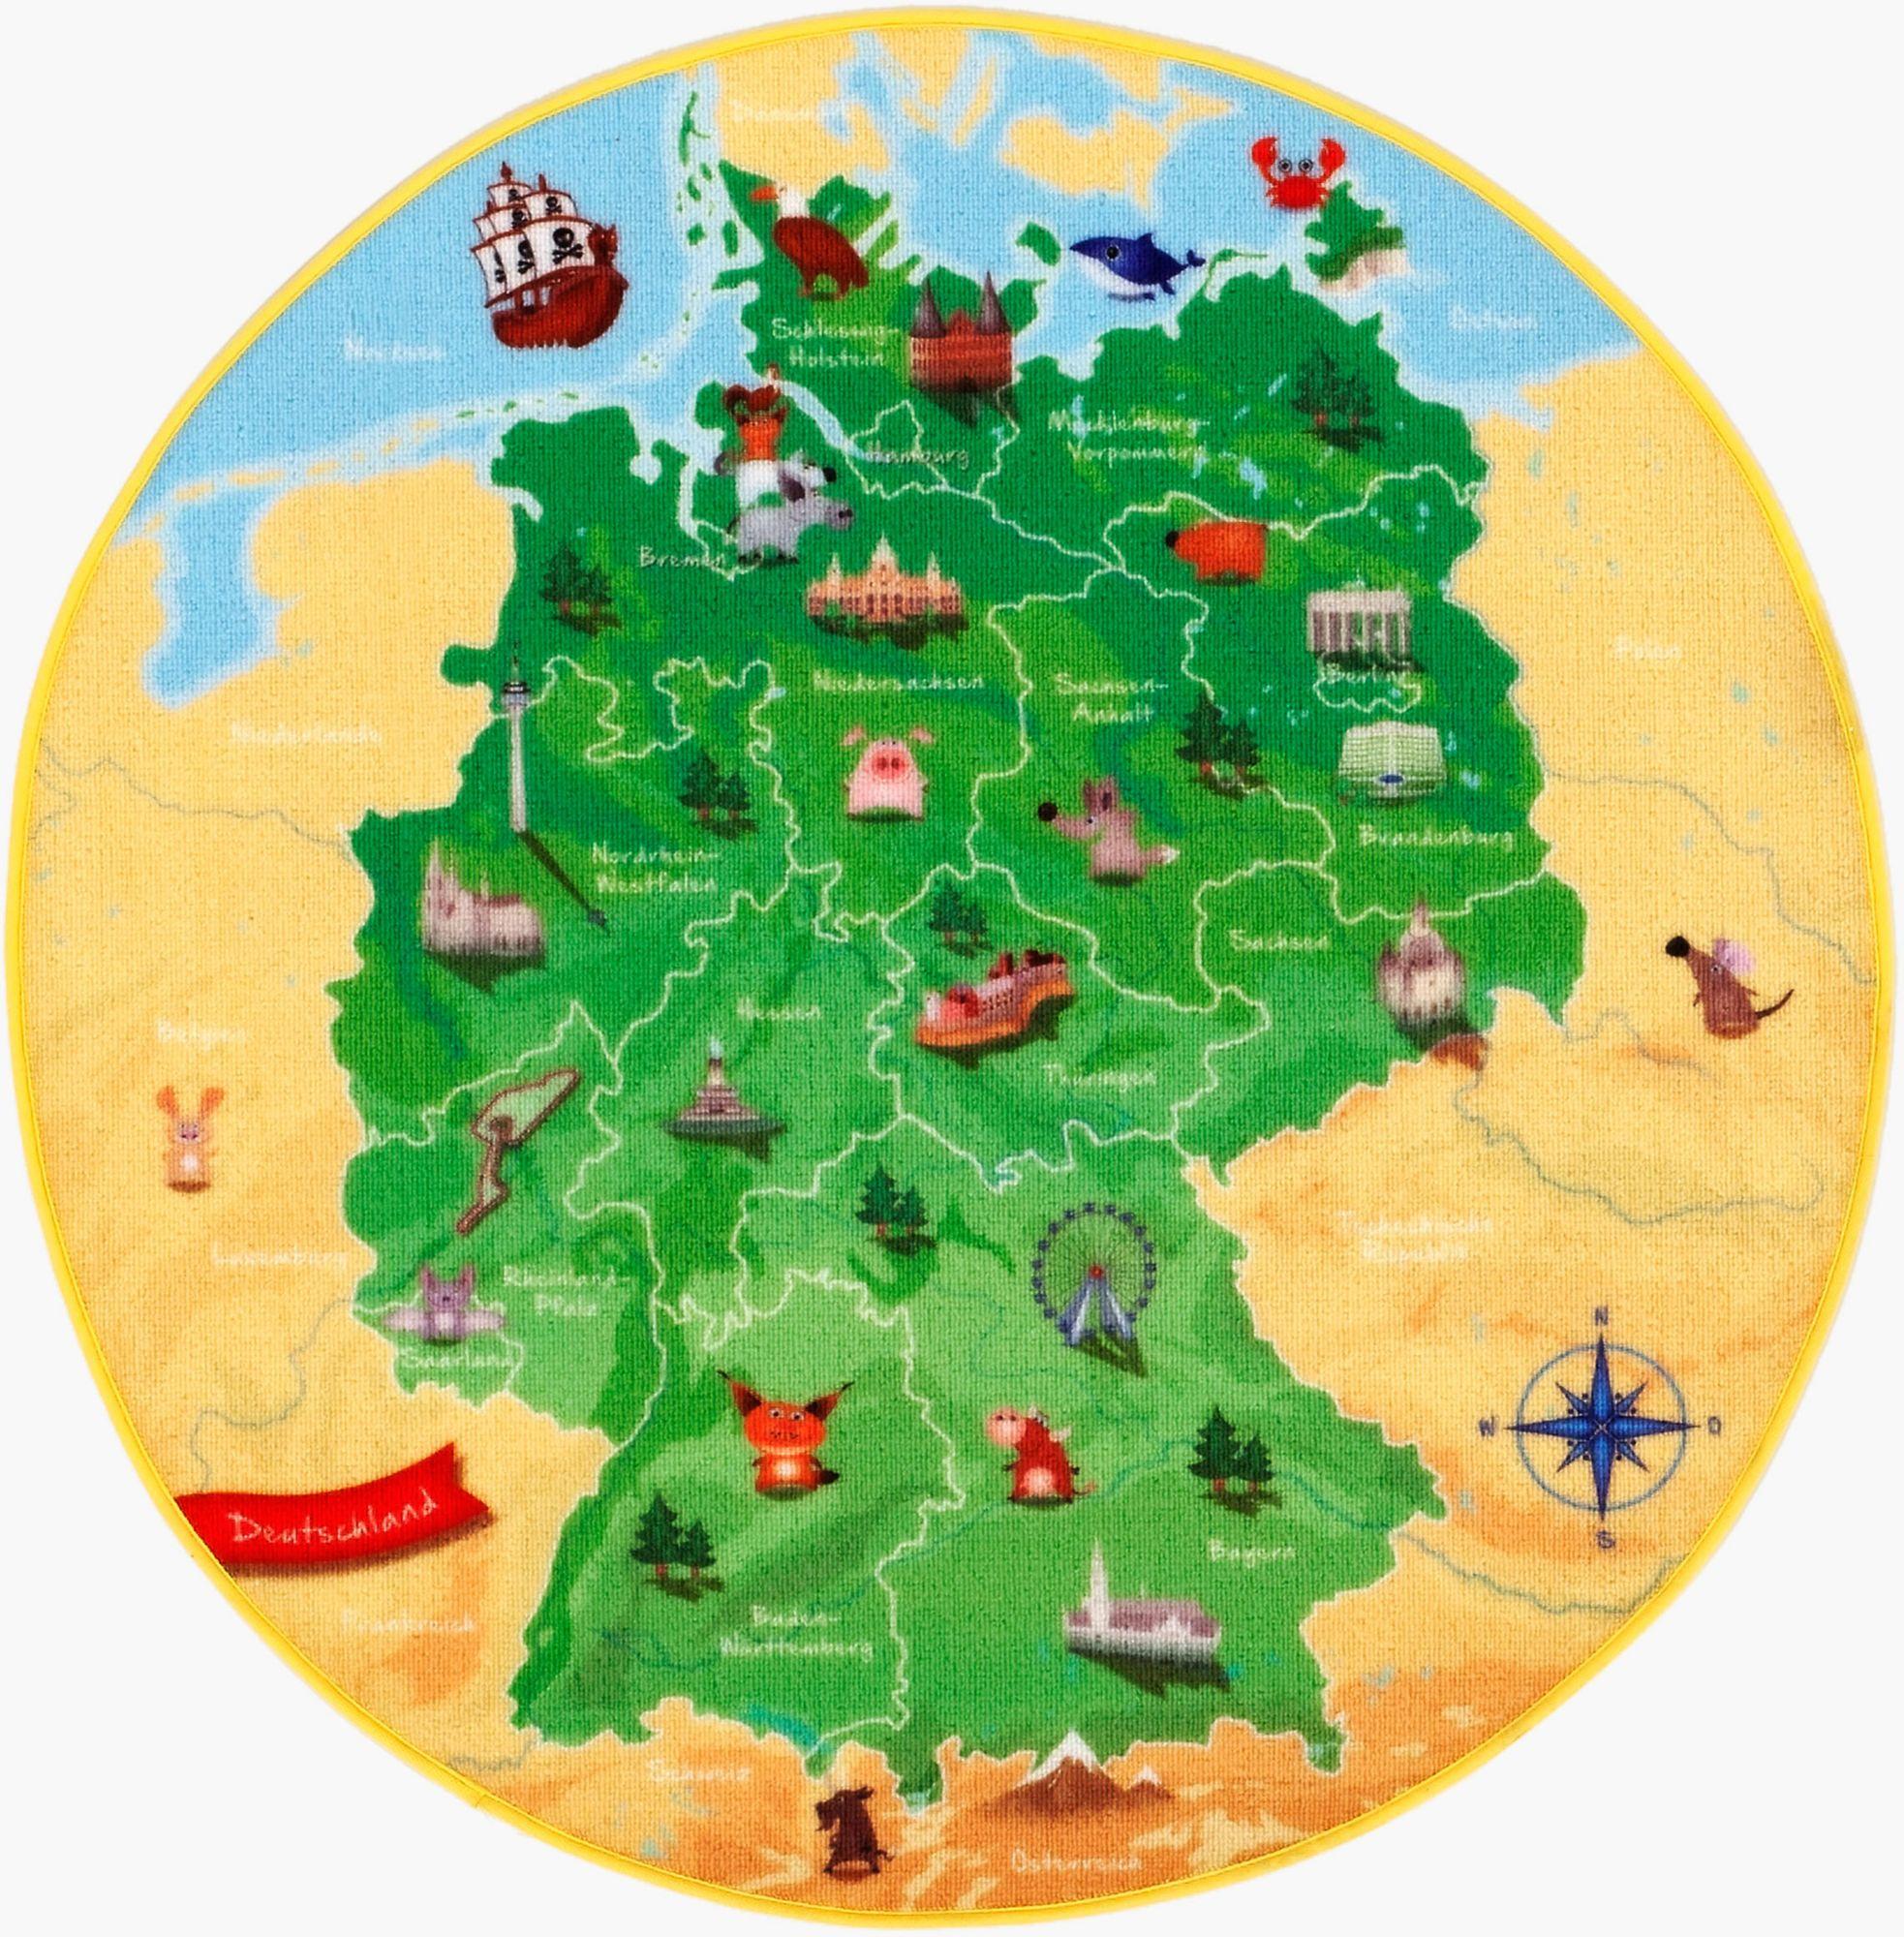 BÖING CARPET Kinder-Teppich, Böing Carpet, »DeutschlandKarte DE-1«, Rund